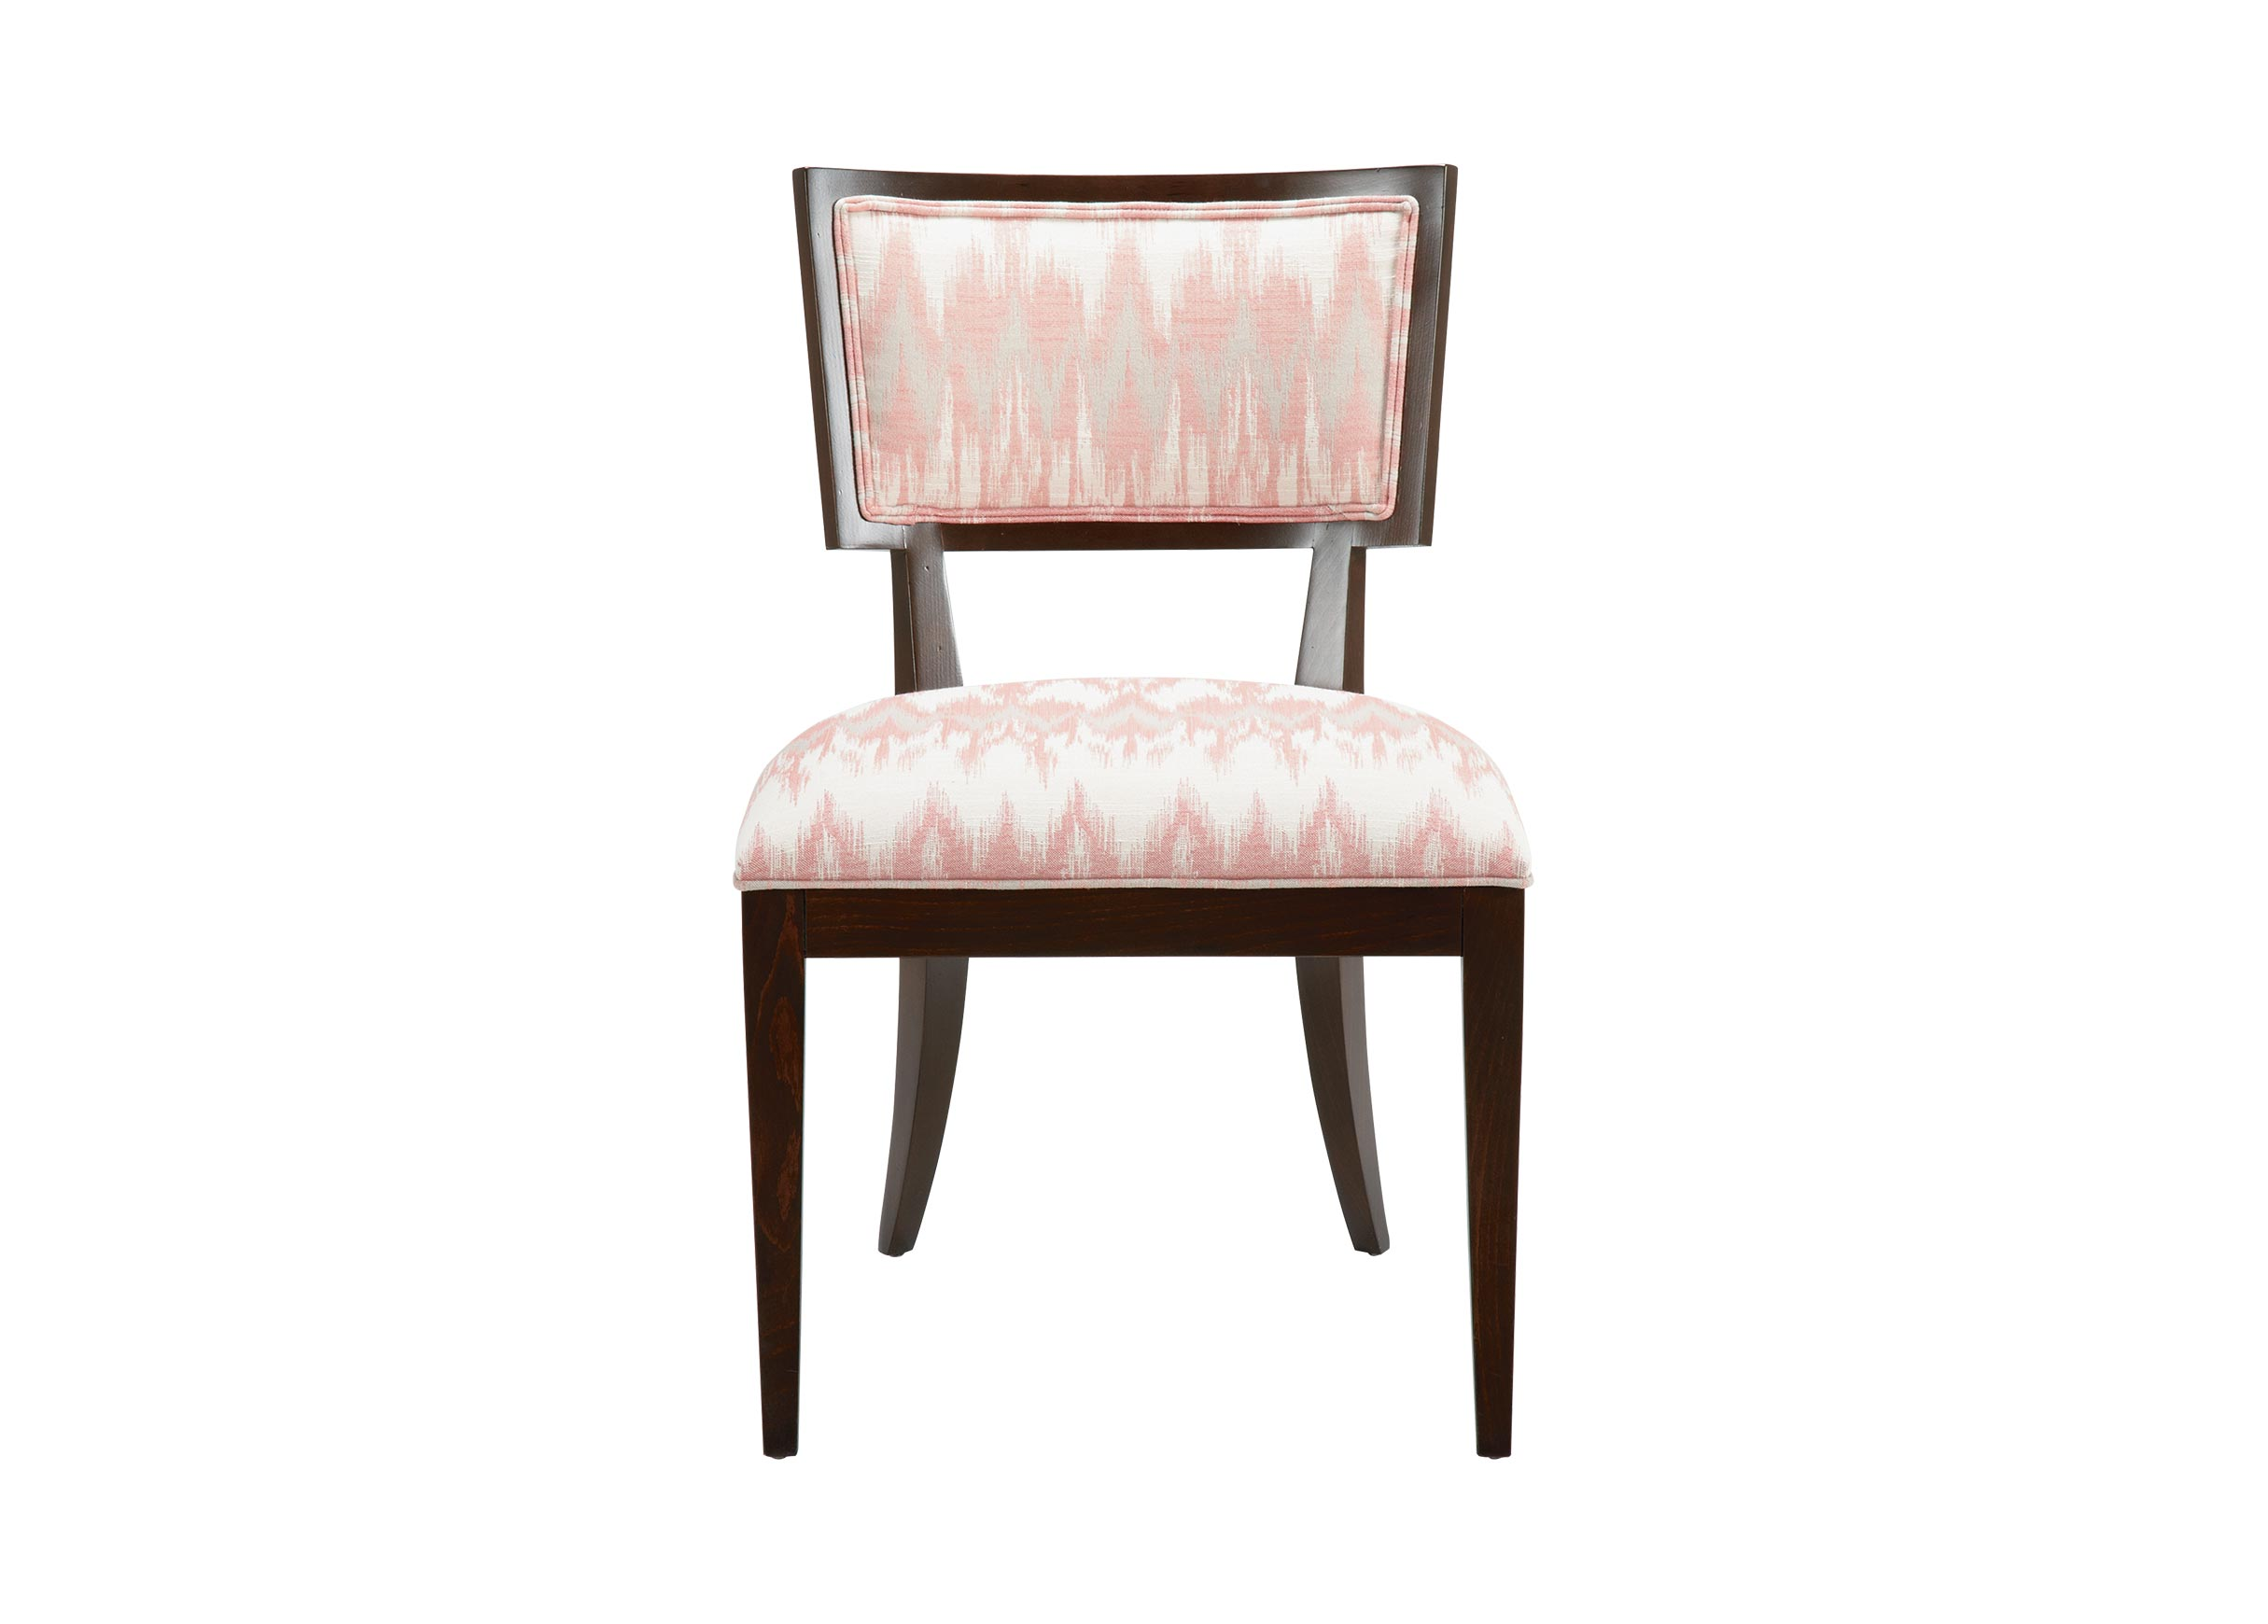 Long Arm Dining Room Chair Cover Barclaydouglas : 20 772219918920front from barclaydouglas.com size 2430 x 1740 jpeg 134kB